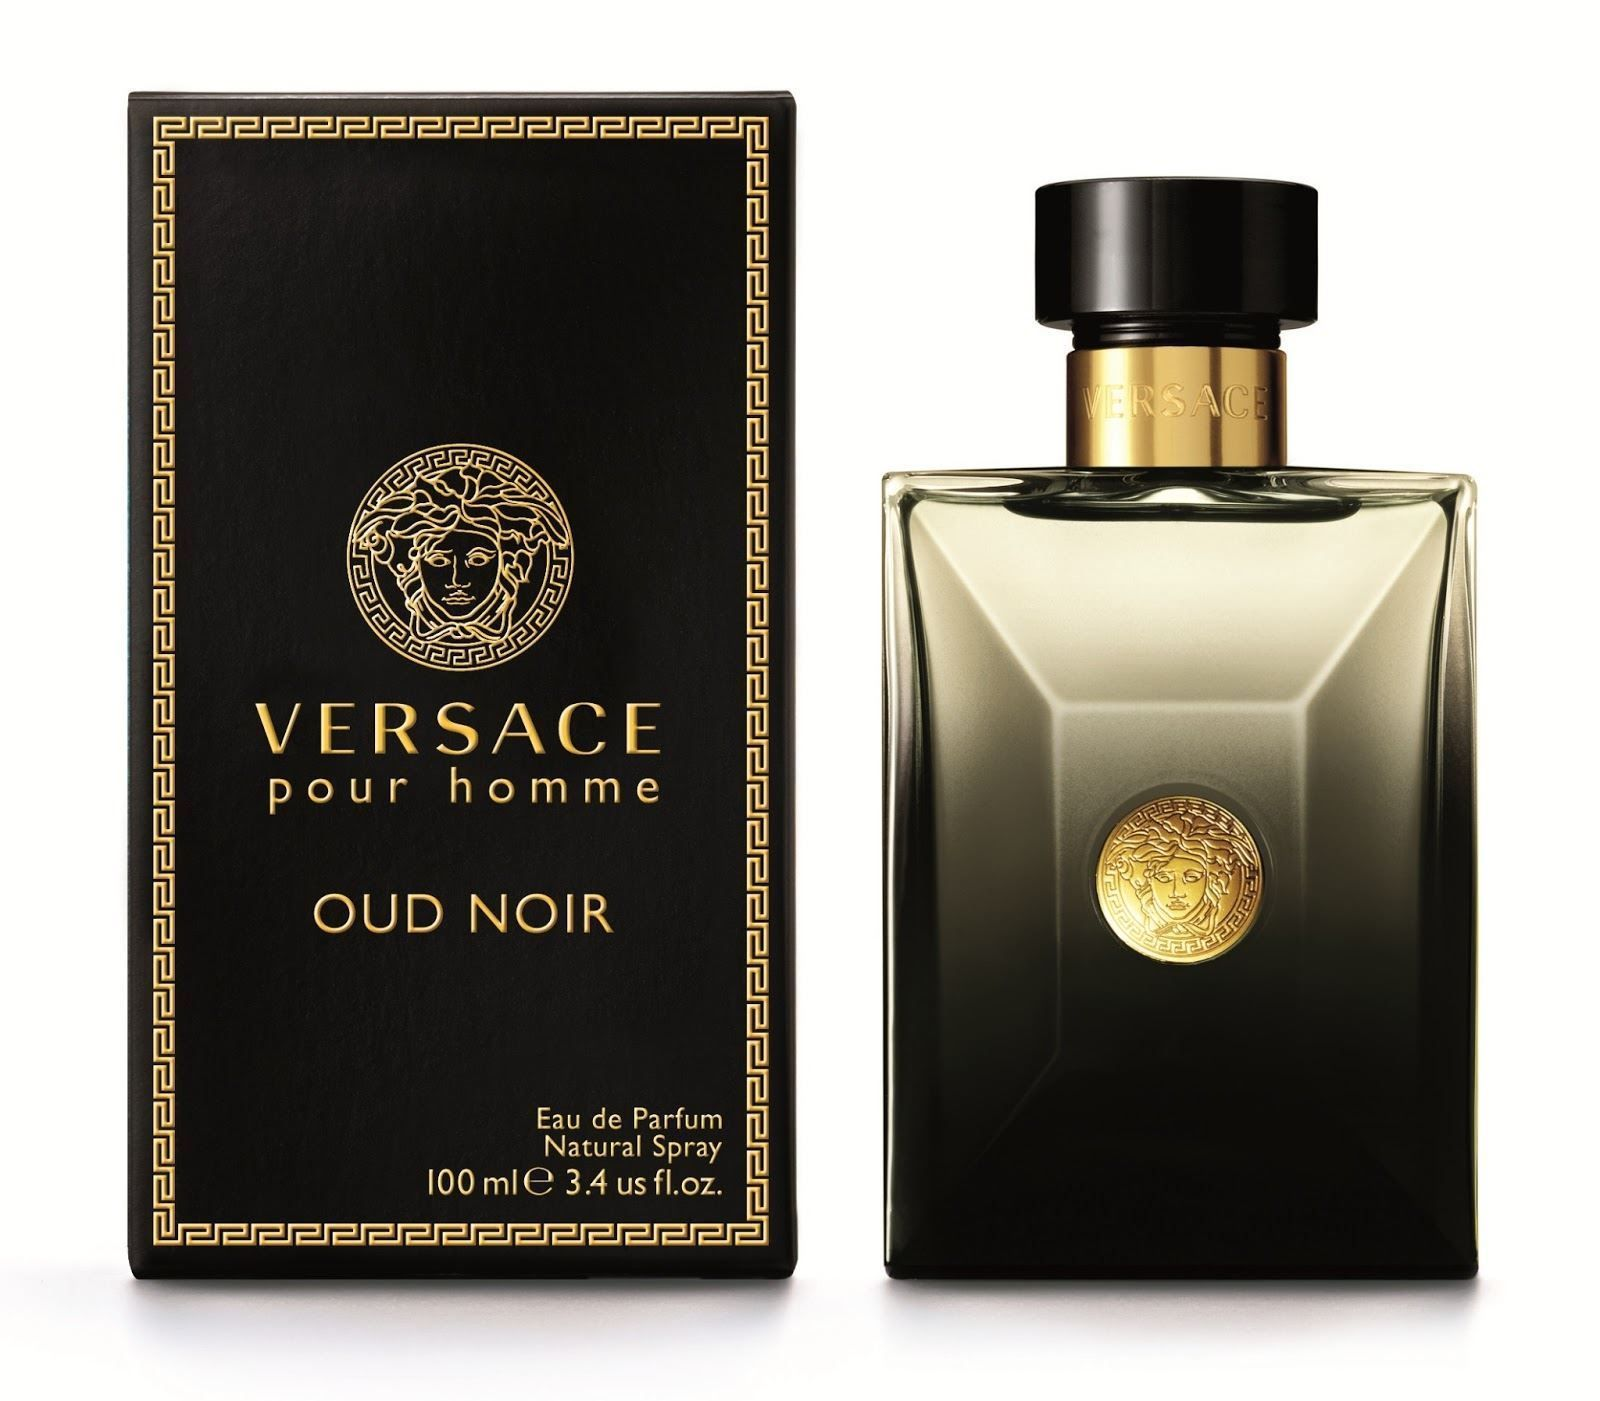 84.95   Versace Oud Noir Eau De Parfum For Men Spray 100 ml 3.4 fl.oz ❤   versace  noir  parfum  spray  fl.oz  acnefree  organic  spa  design  sexy  ... 08e811adde7